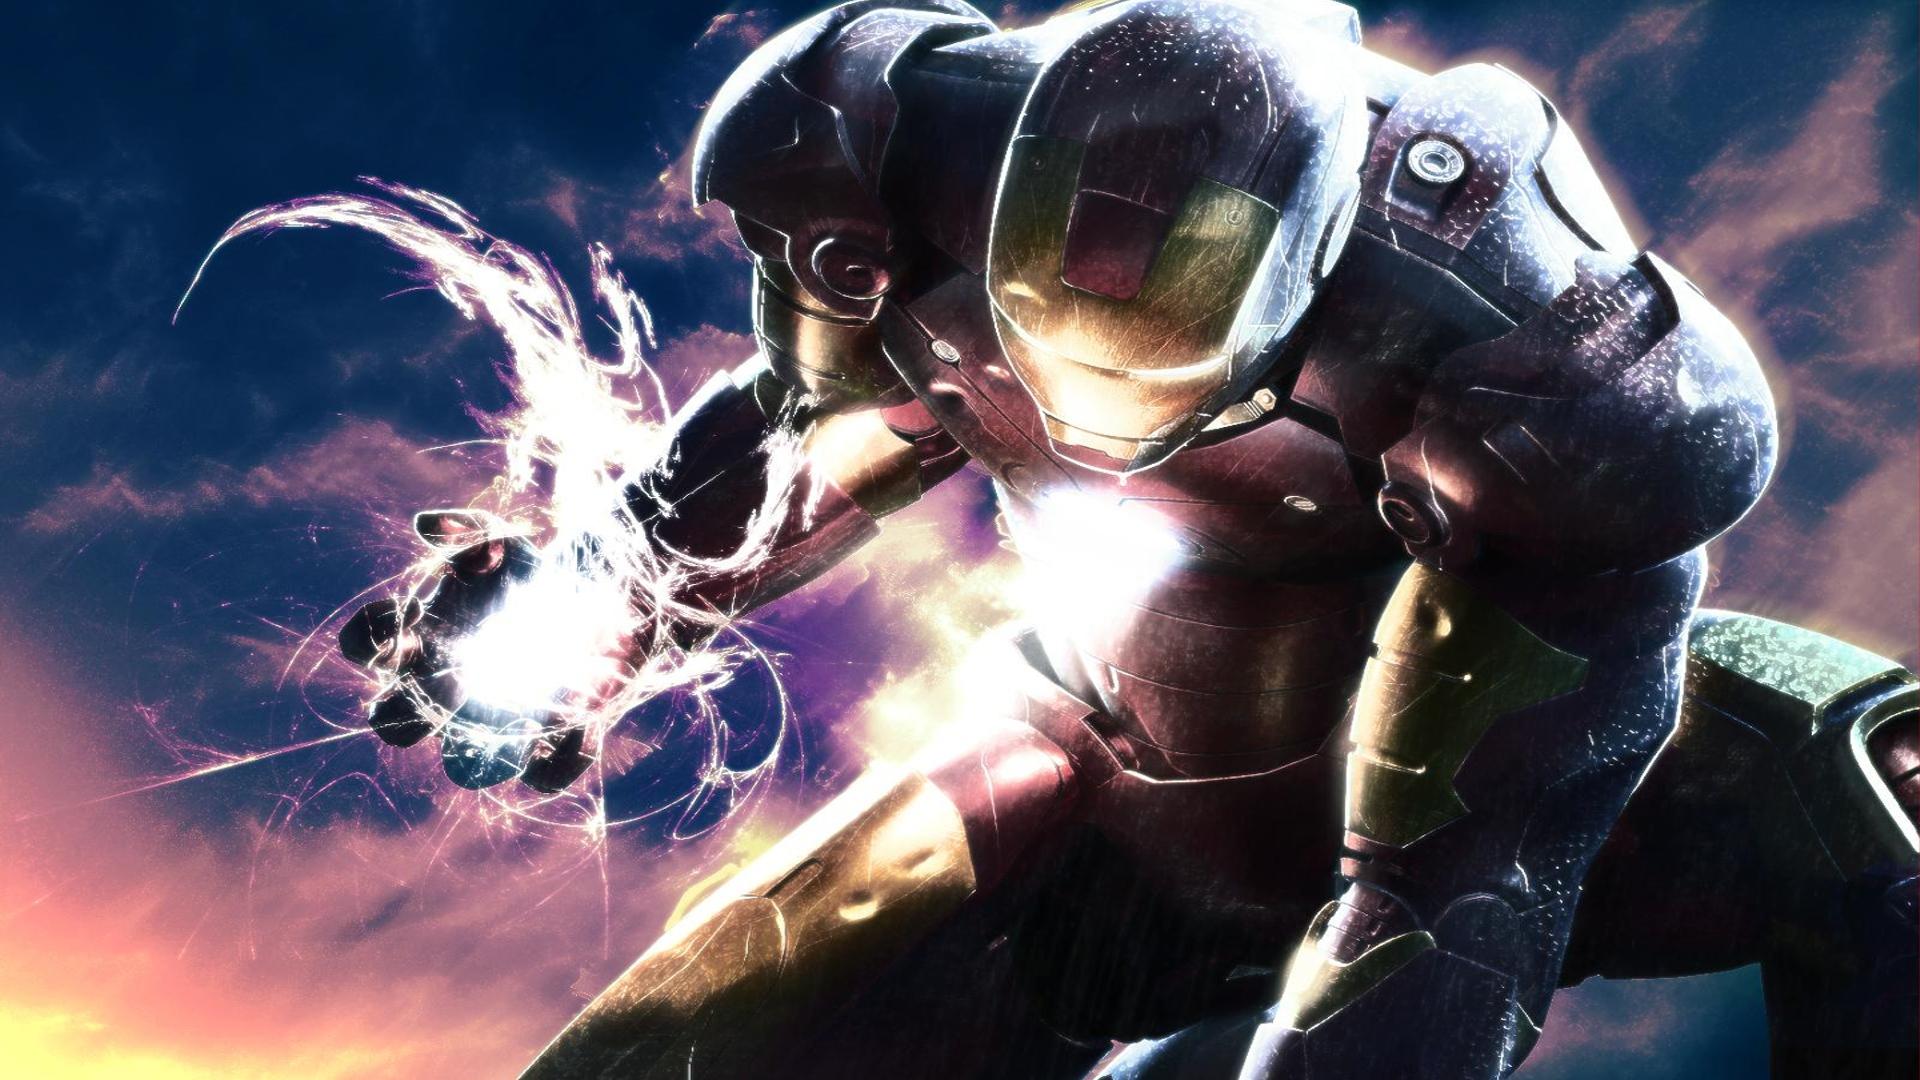 Hope you like this Ironman HD HD Wallpaper